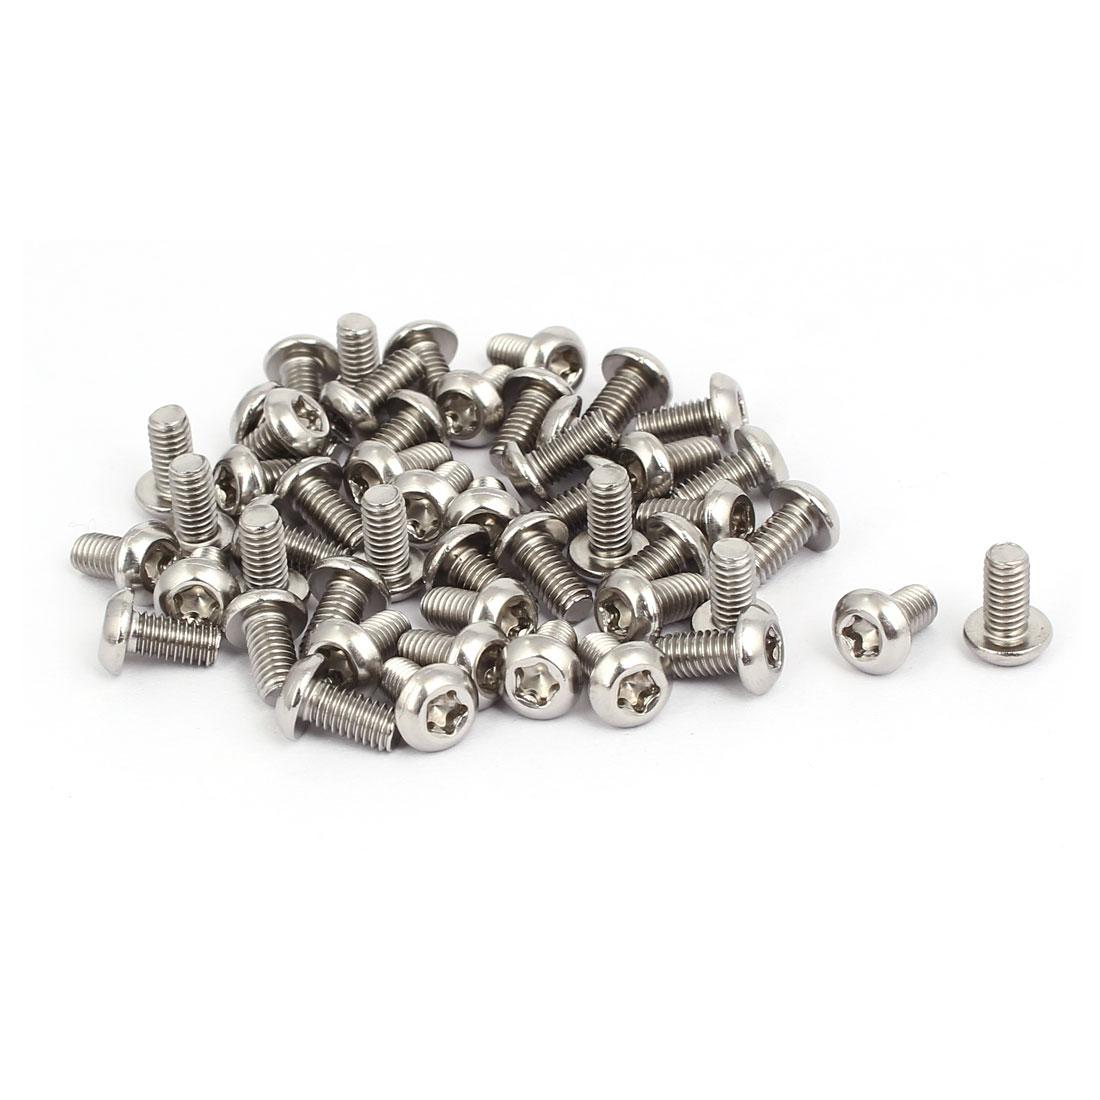 M4x8mm 304 Stainless Steel Fully Thread Button Head Torx Five-Lobe Screw 50pcs